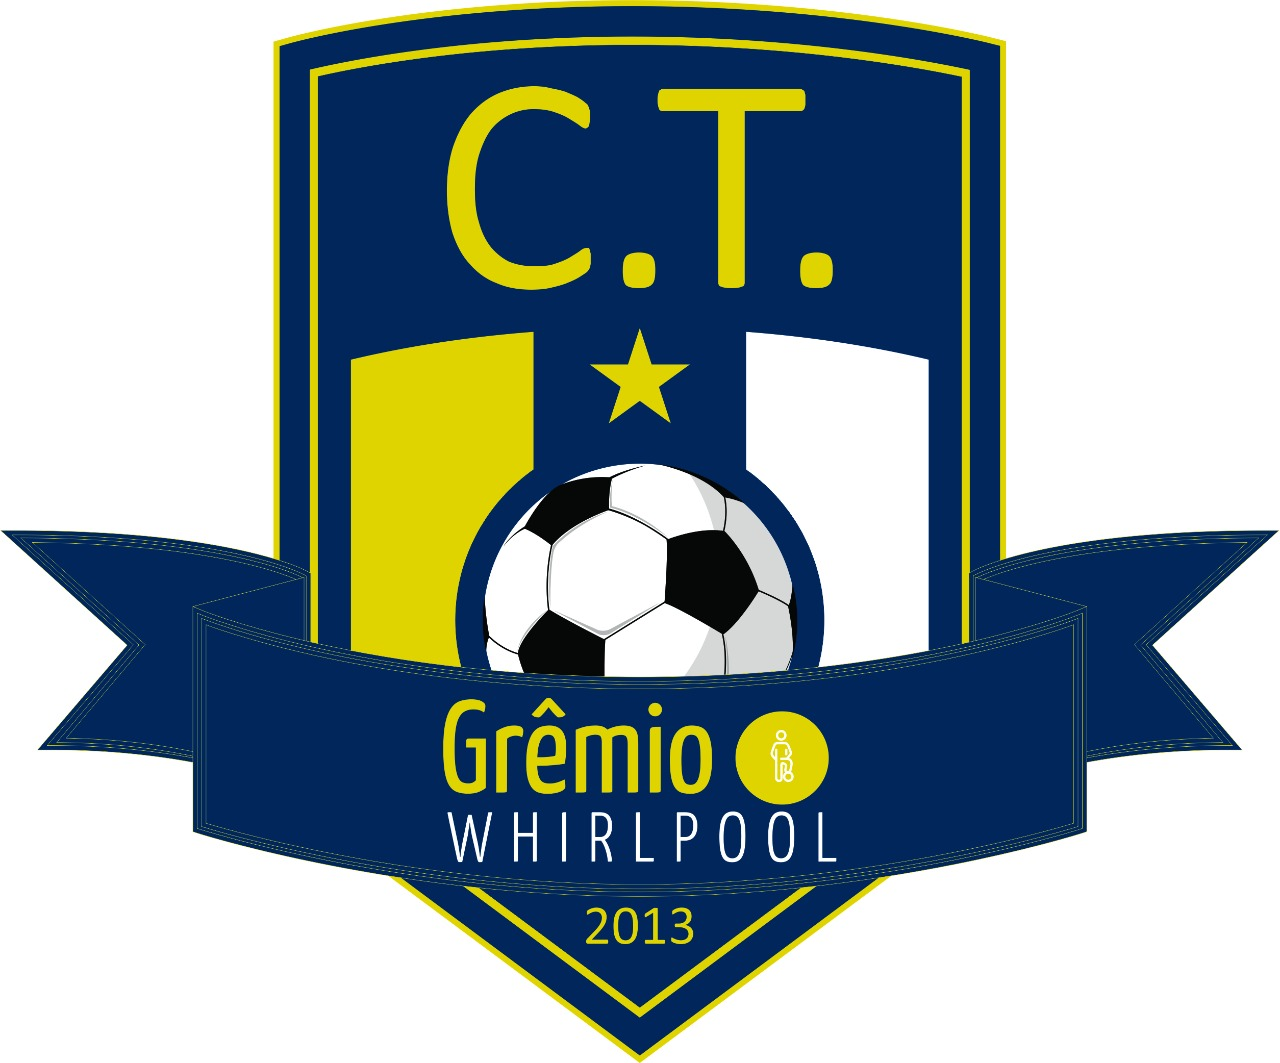 Grêmio Whirlpool